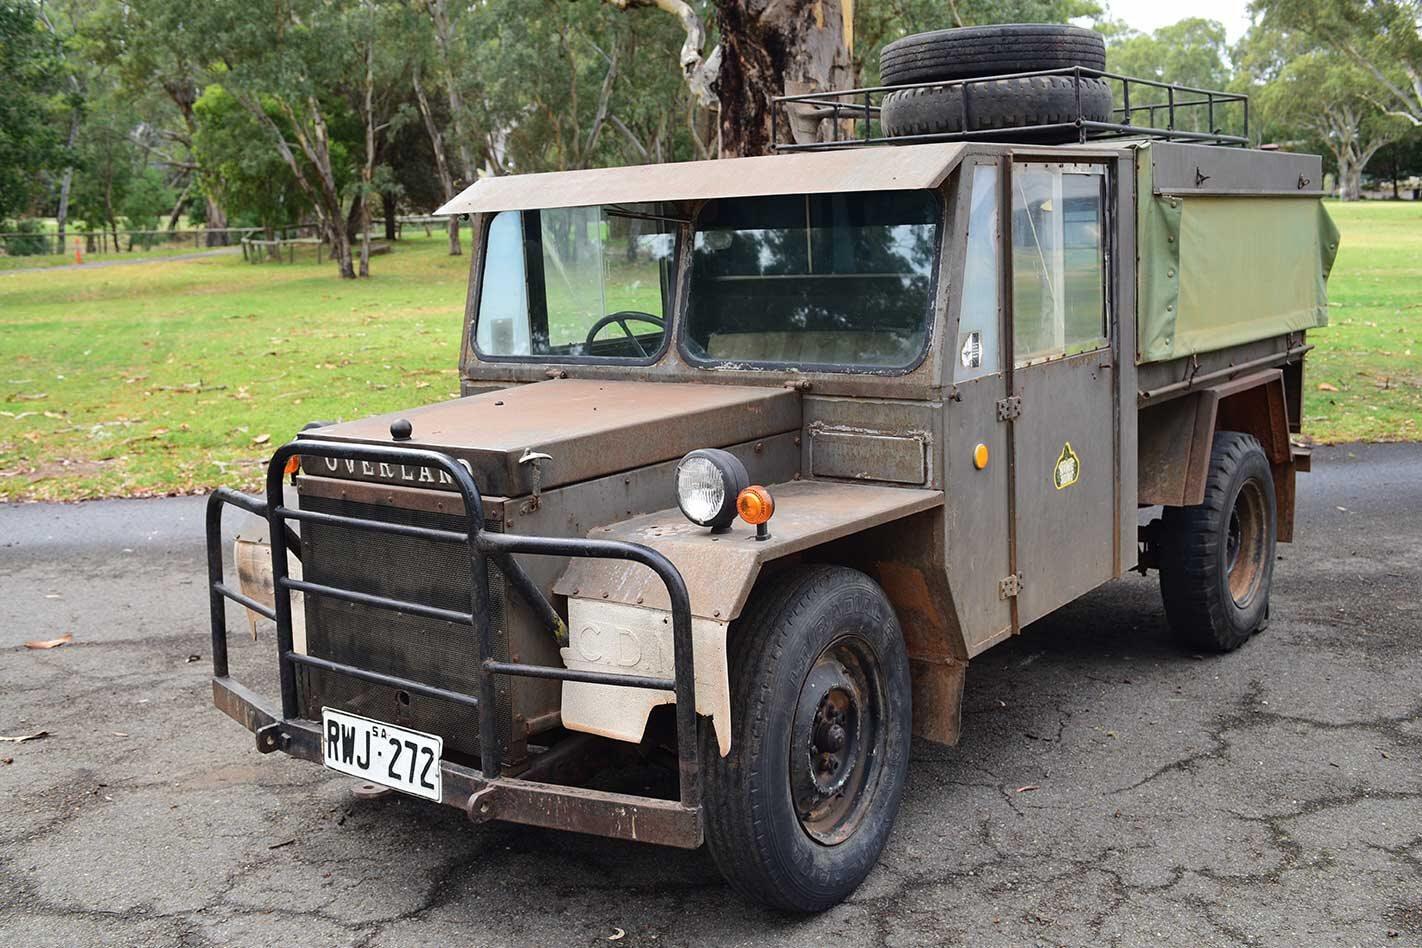 Toyota 79 Series LandCruiser Bruder EXP-6 caravan